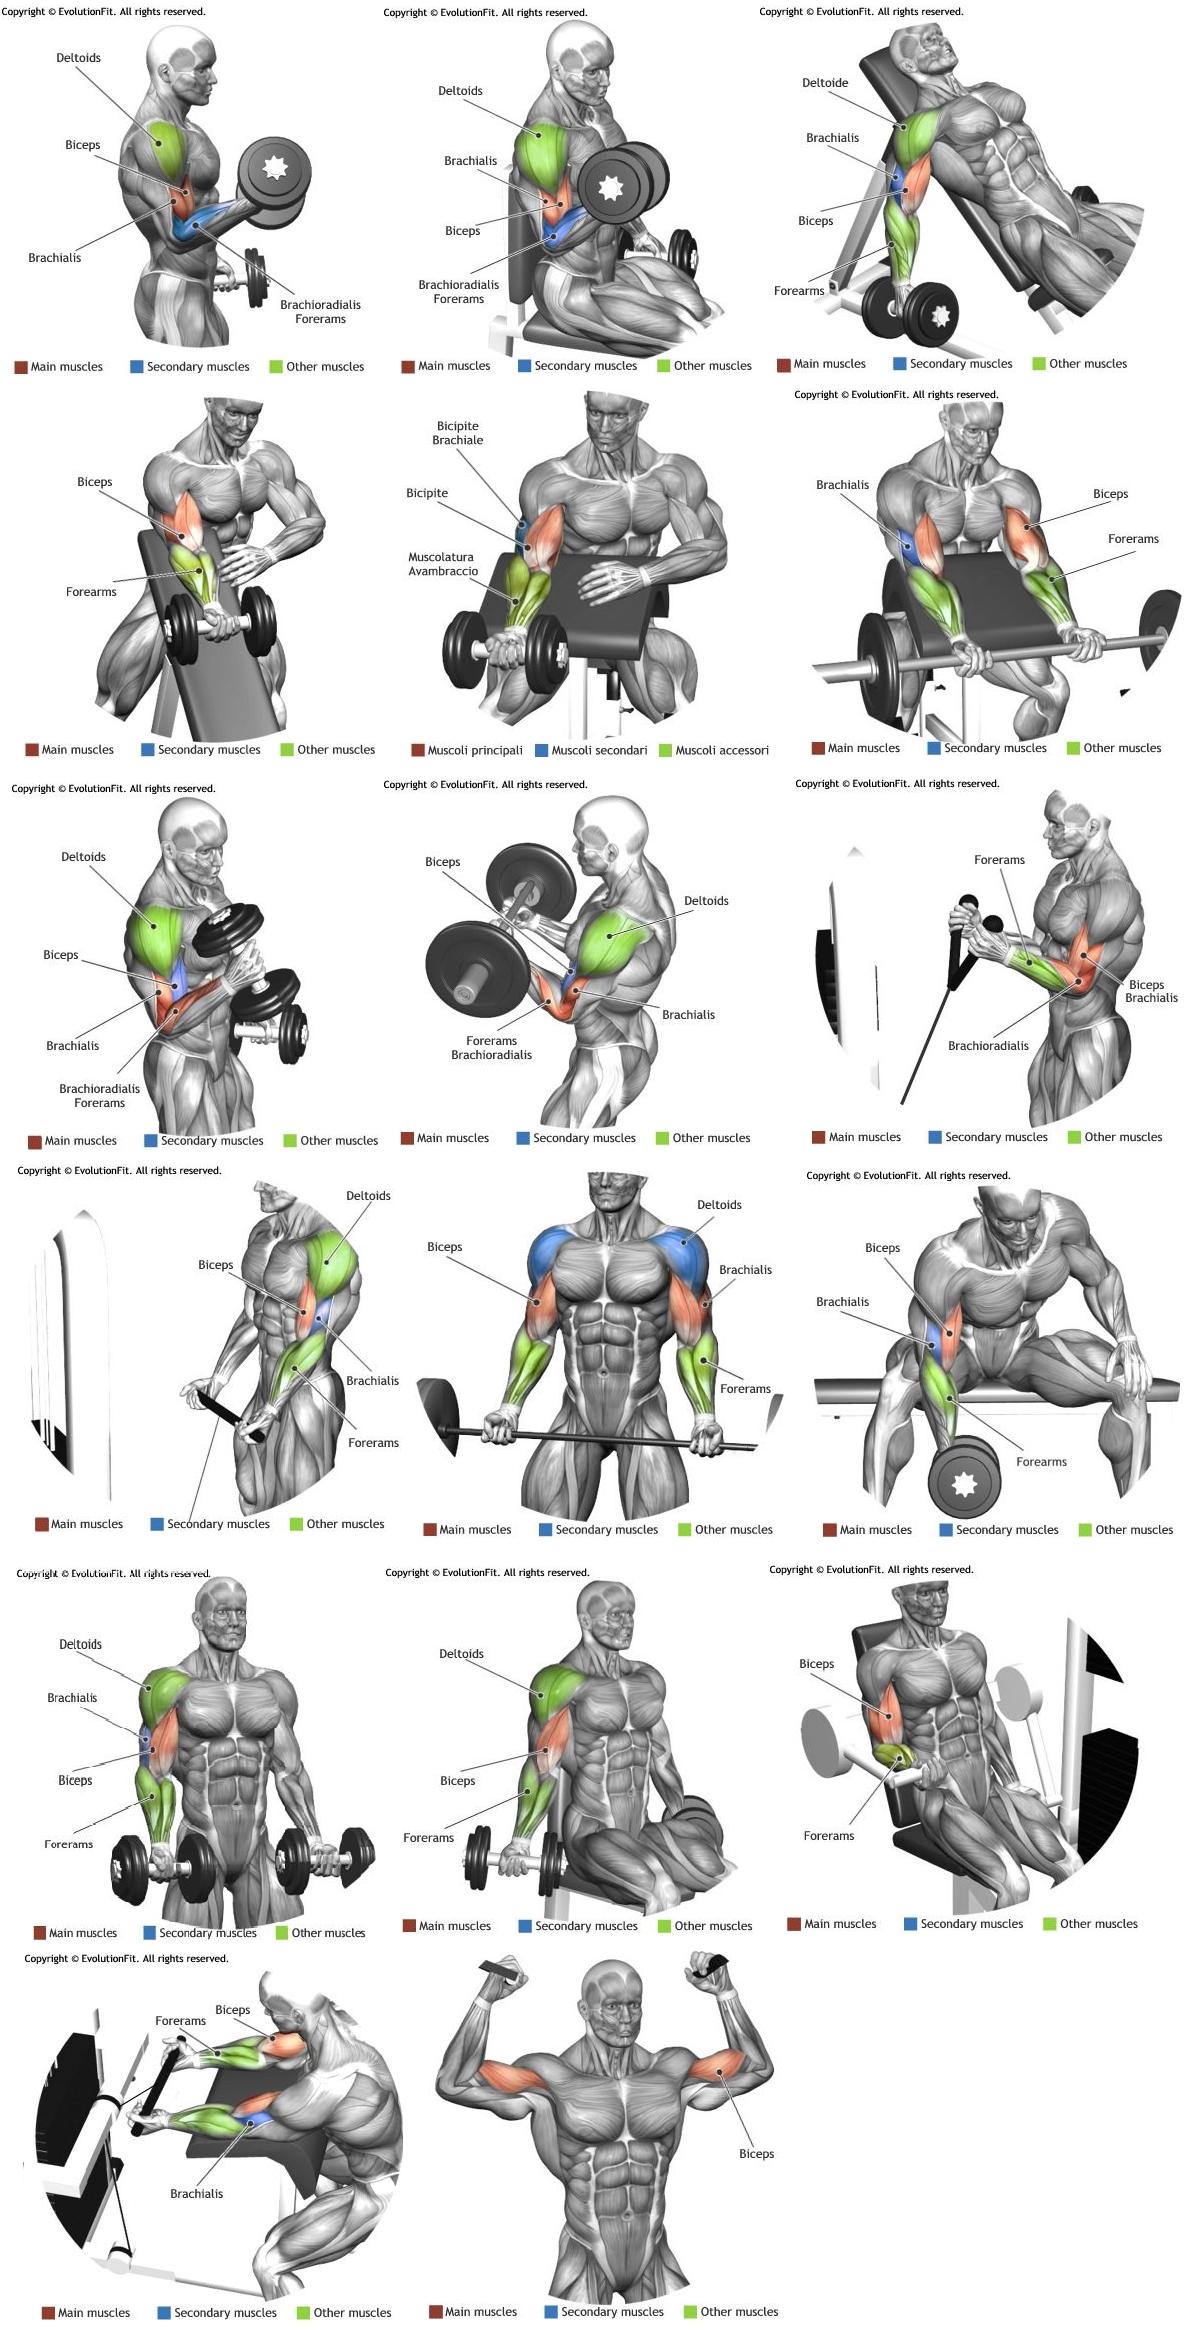 Bra clipart forearm. Biceps e braquial muscle